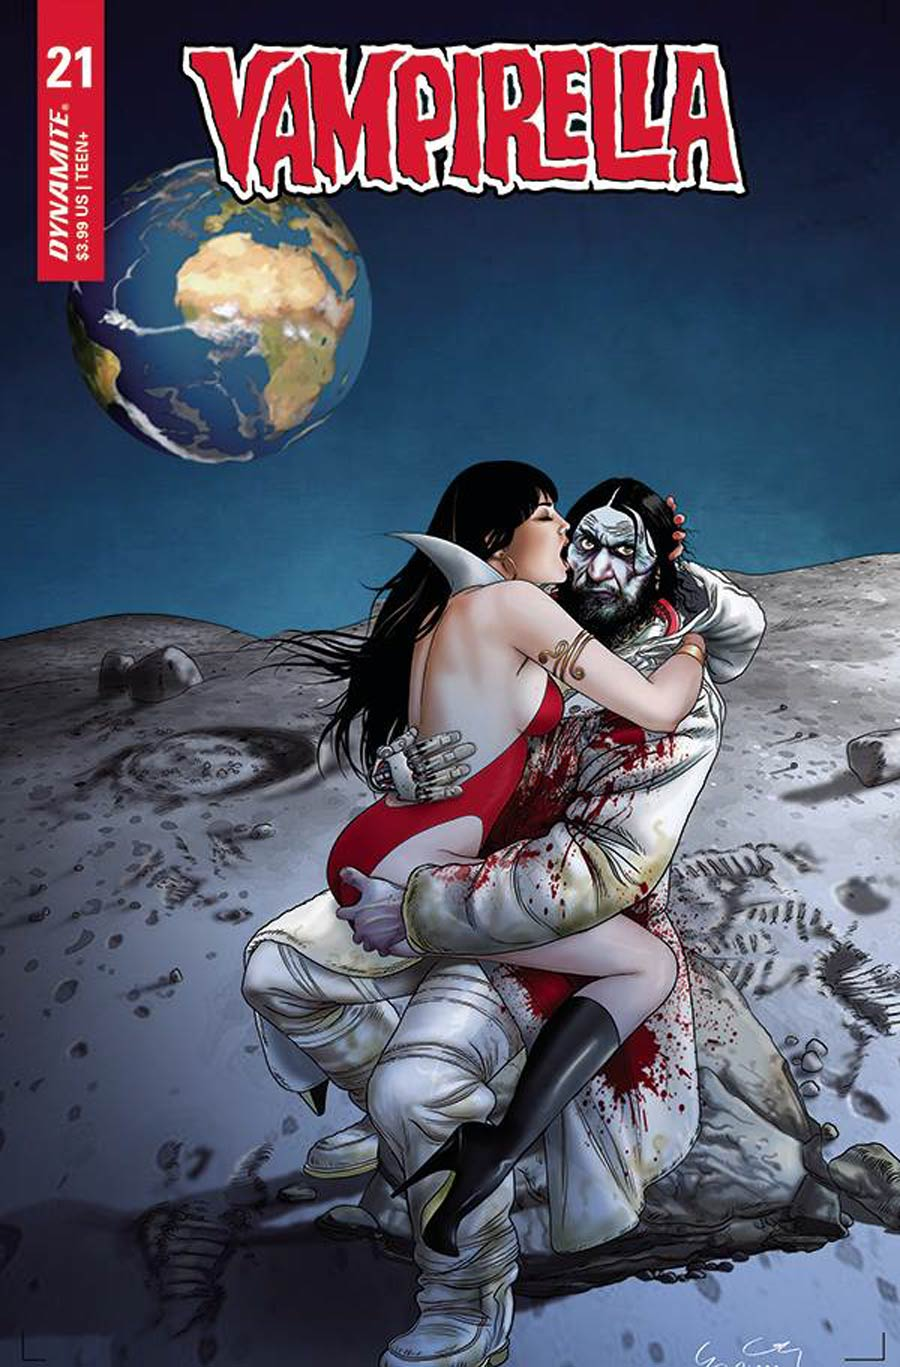 Vampirella Vol 8 #21 Cover D Variant Ergun Gunduz Cover